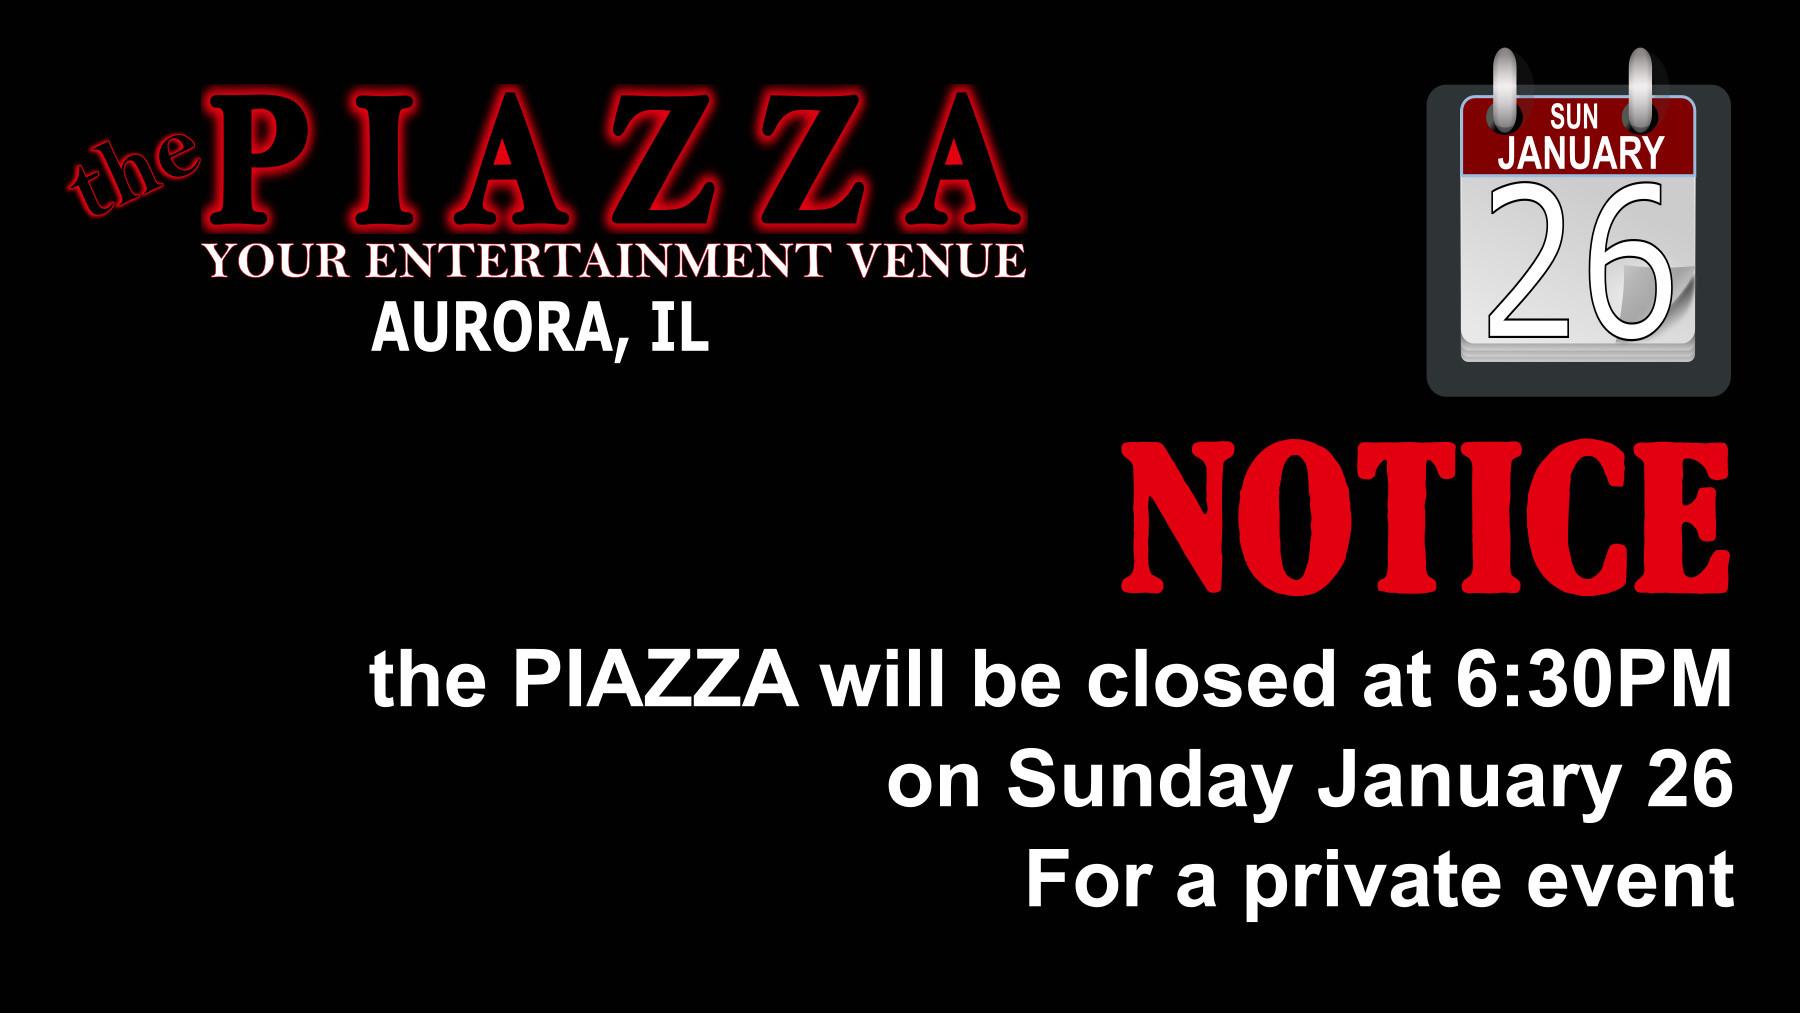 closing at 6:30pm on Sun Jan 26 @ the PIAZZA - Aurora